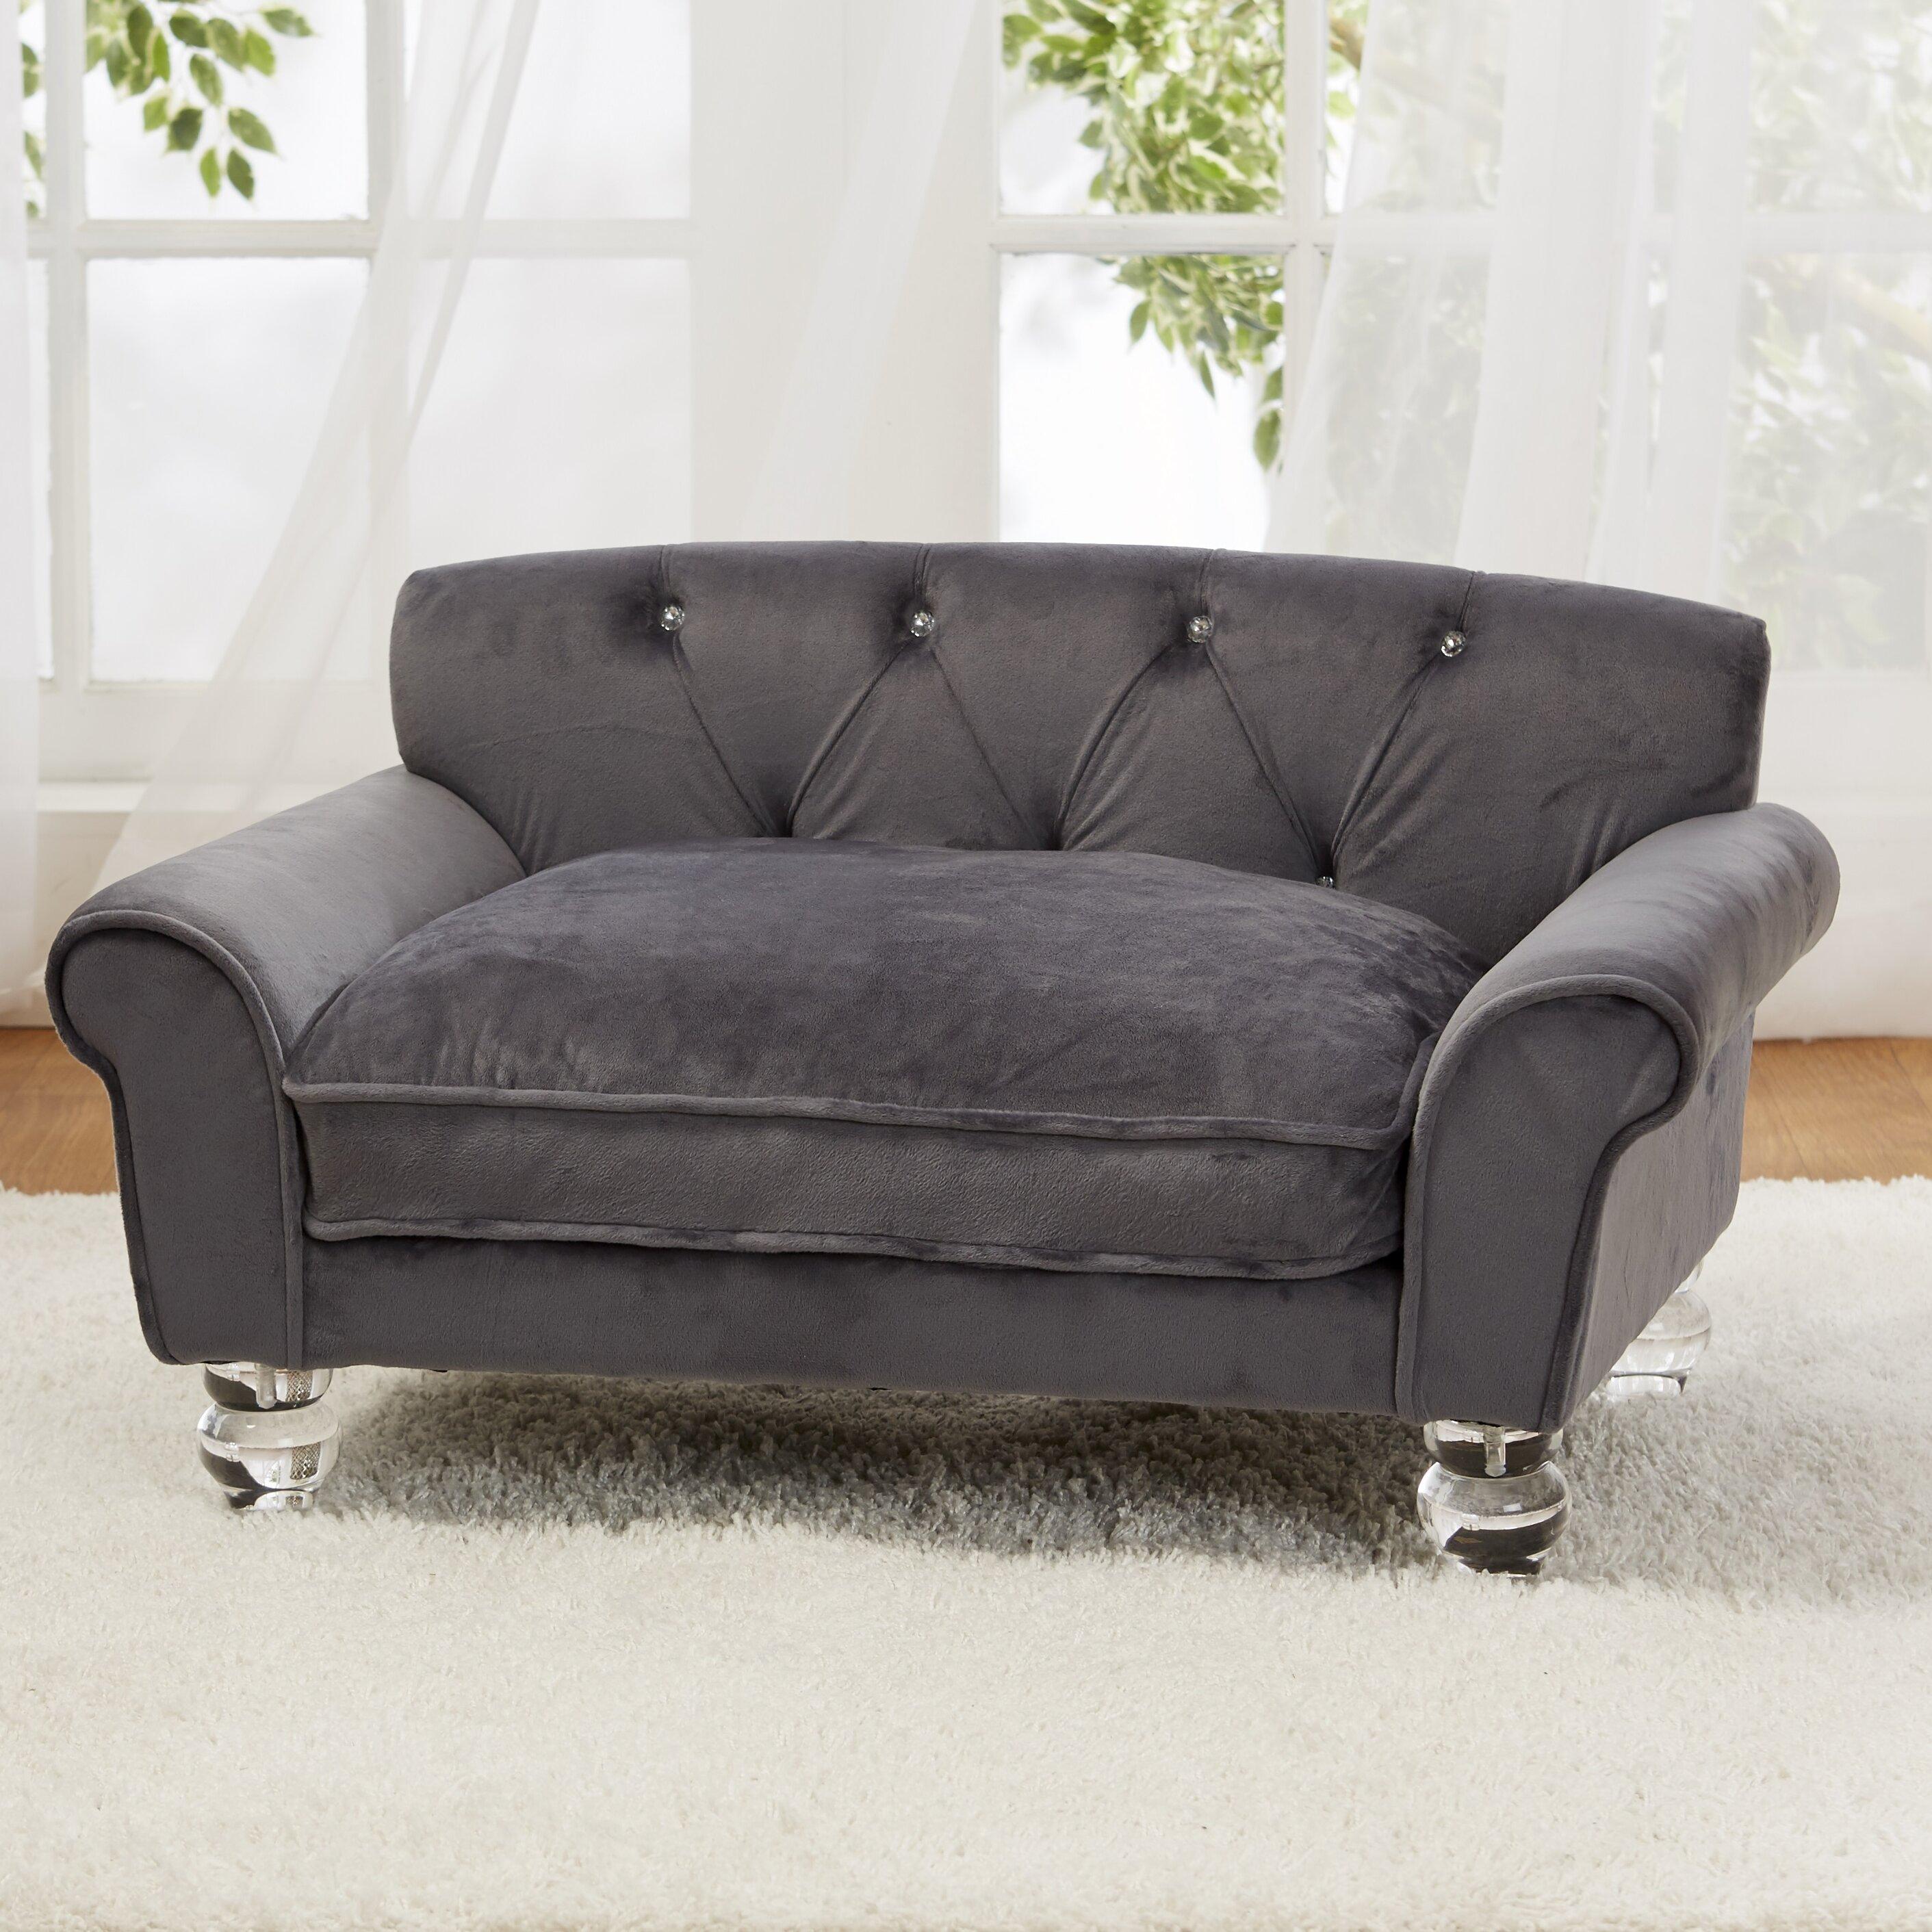 enchanted home pet la joie velvet dog sofa with cushion. Black Bedroom Furniture Sets. Home Design Ideas